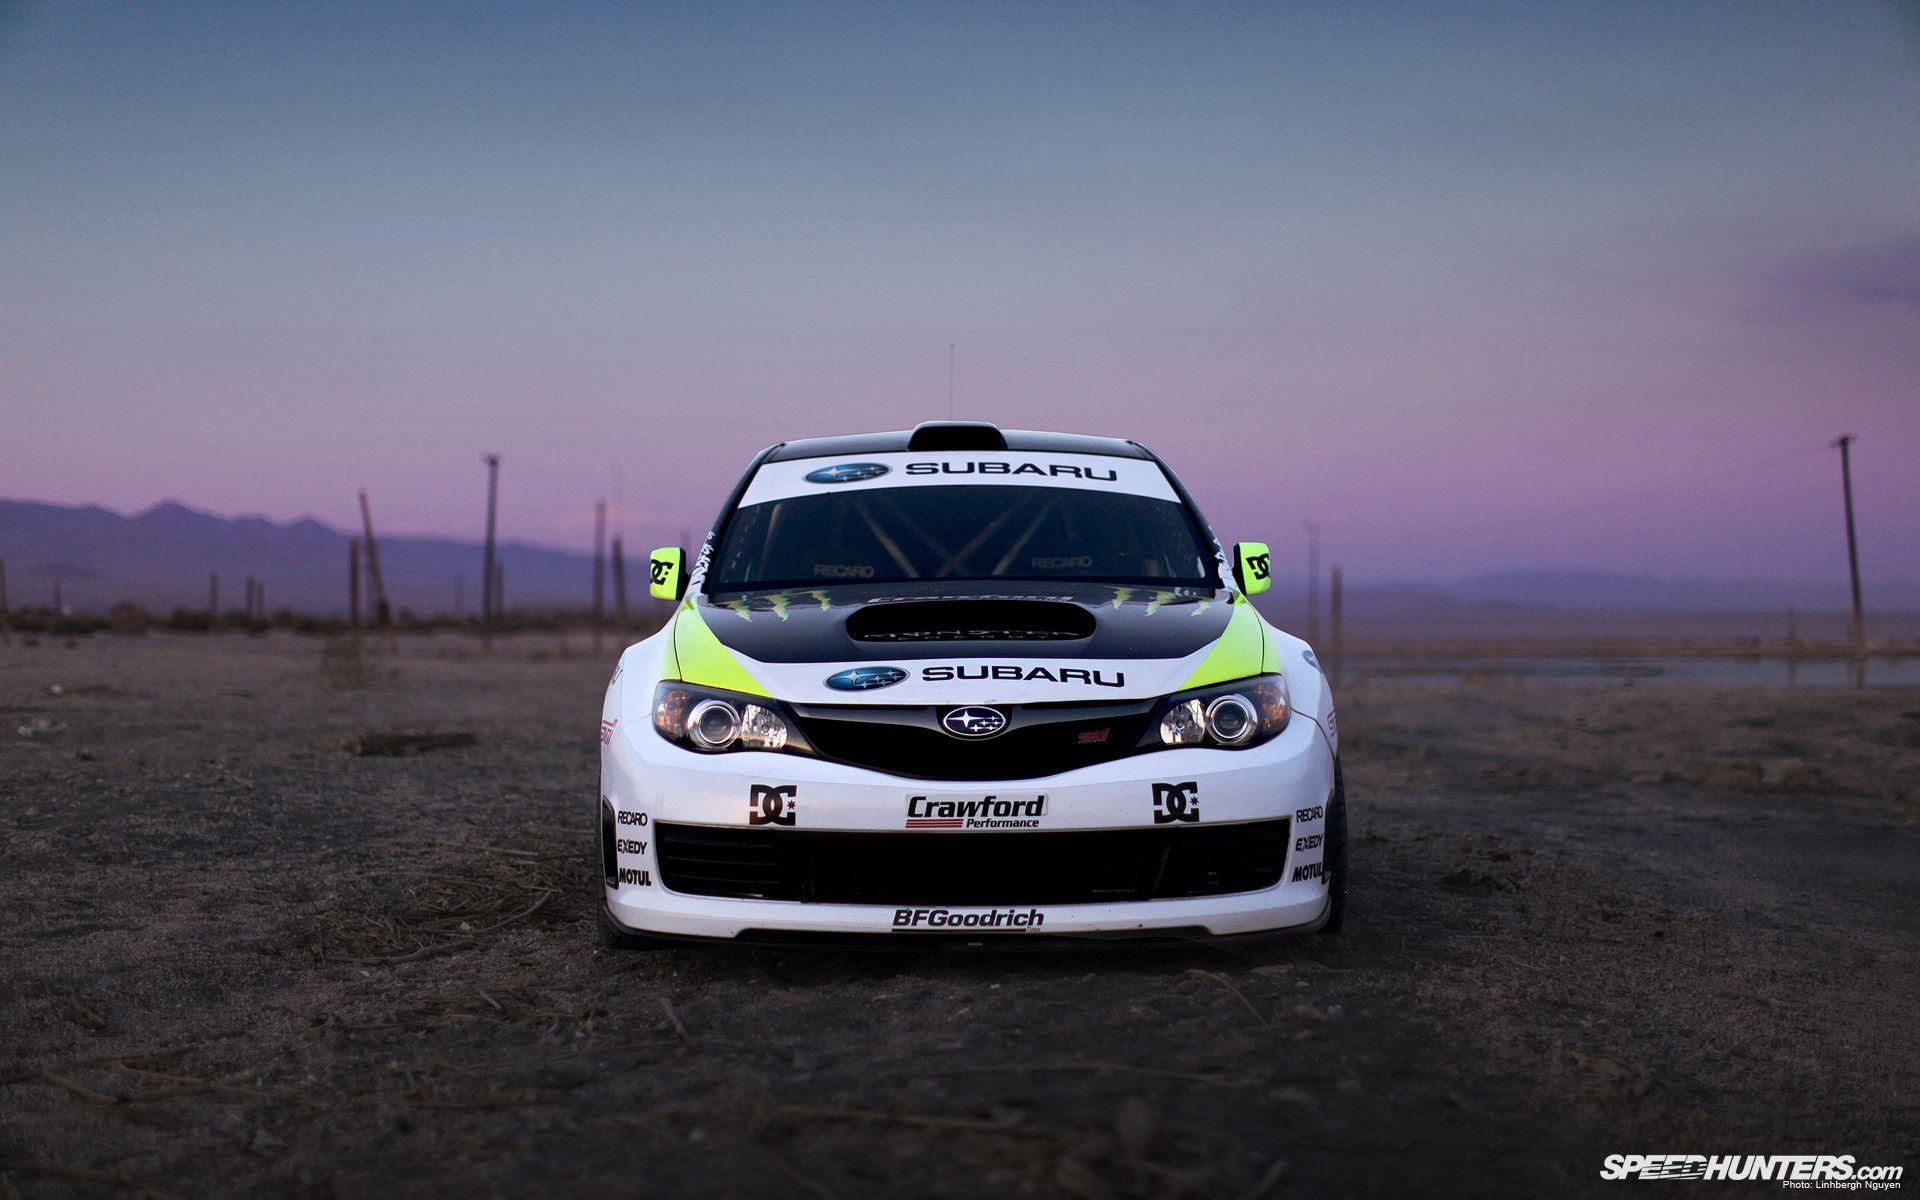 download 1548237 Subaru Wallpapers HD wallpapers backgrounds 1920x1200